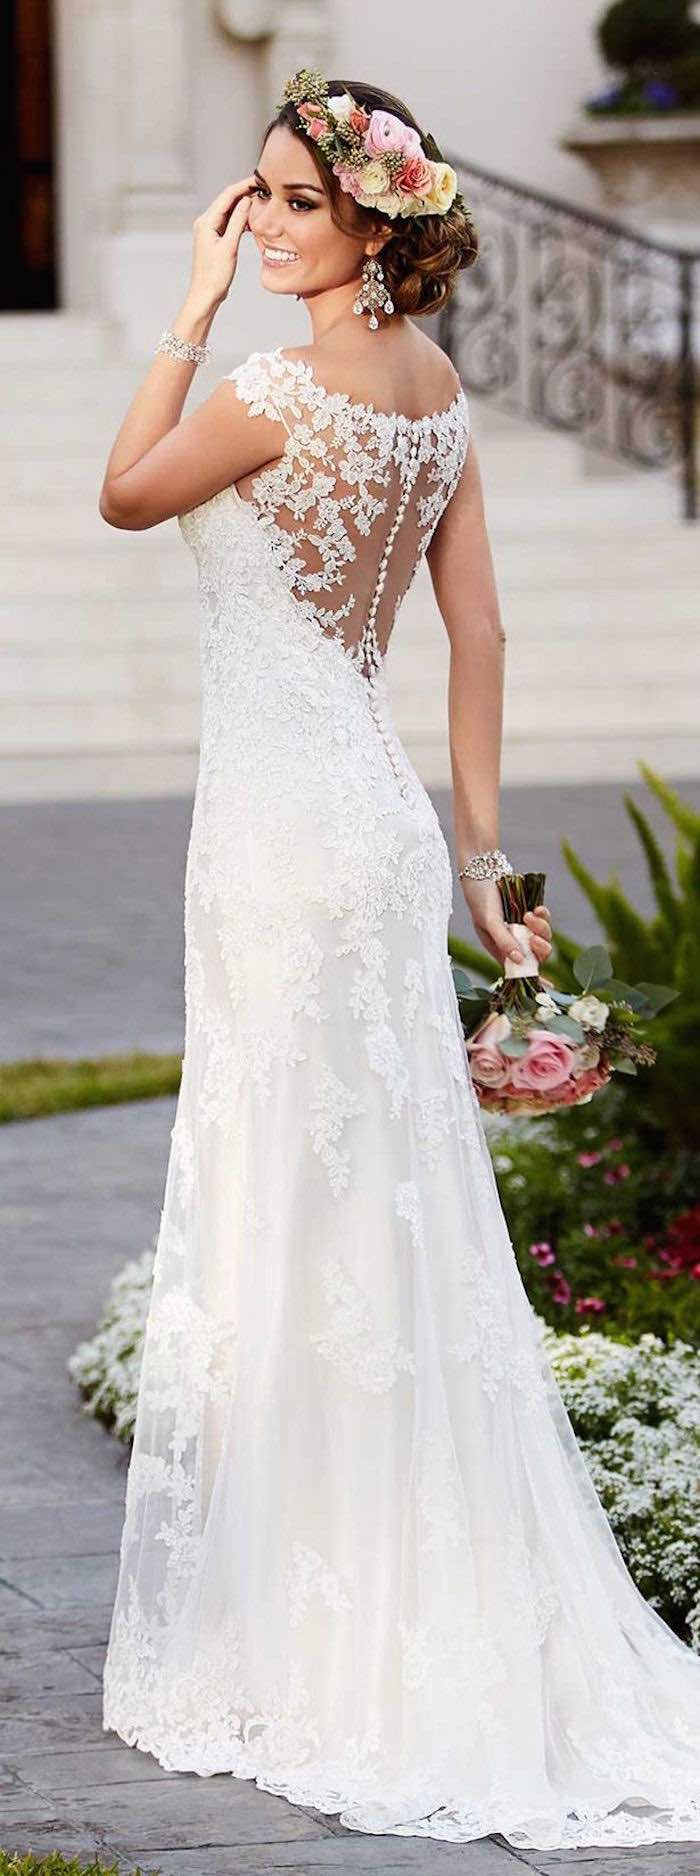 perfect wedding dress lace flowy wedding dress Stella York lace wedding dress